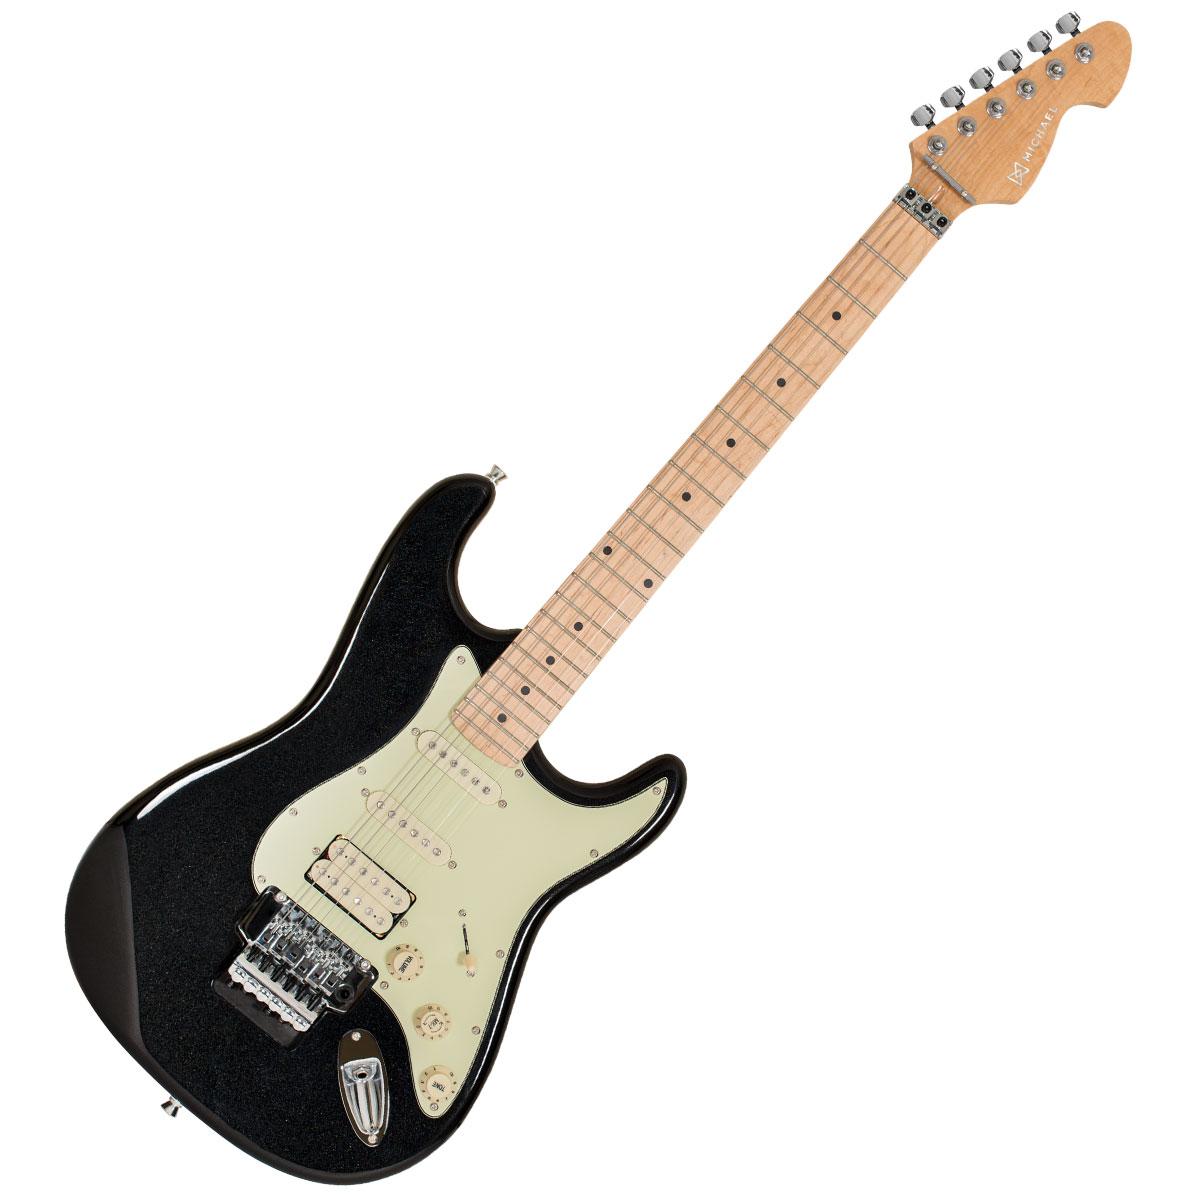 Guitarra Strato Fly Advanced GM247 MBK Preta Metálica - Michael